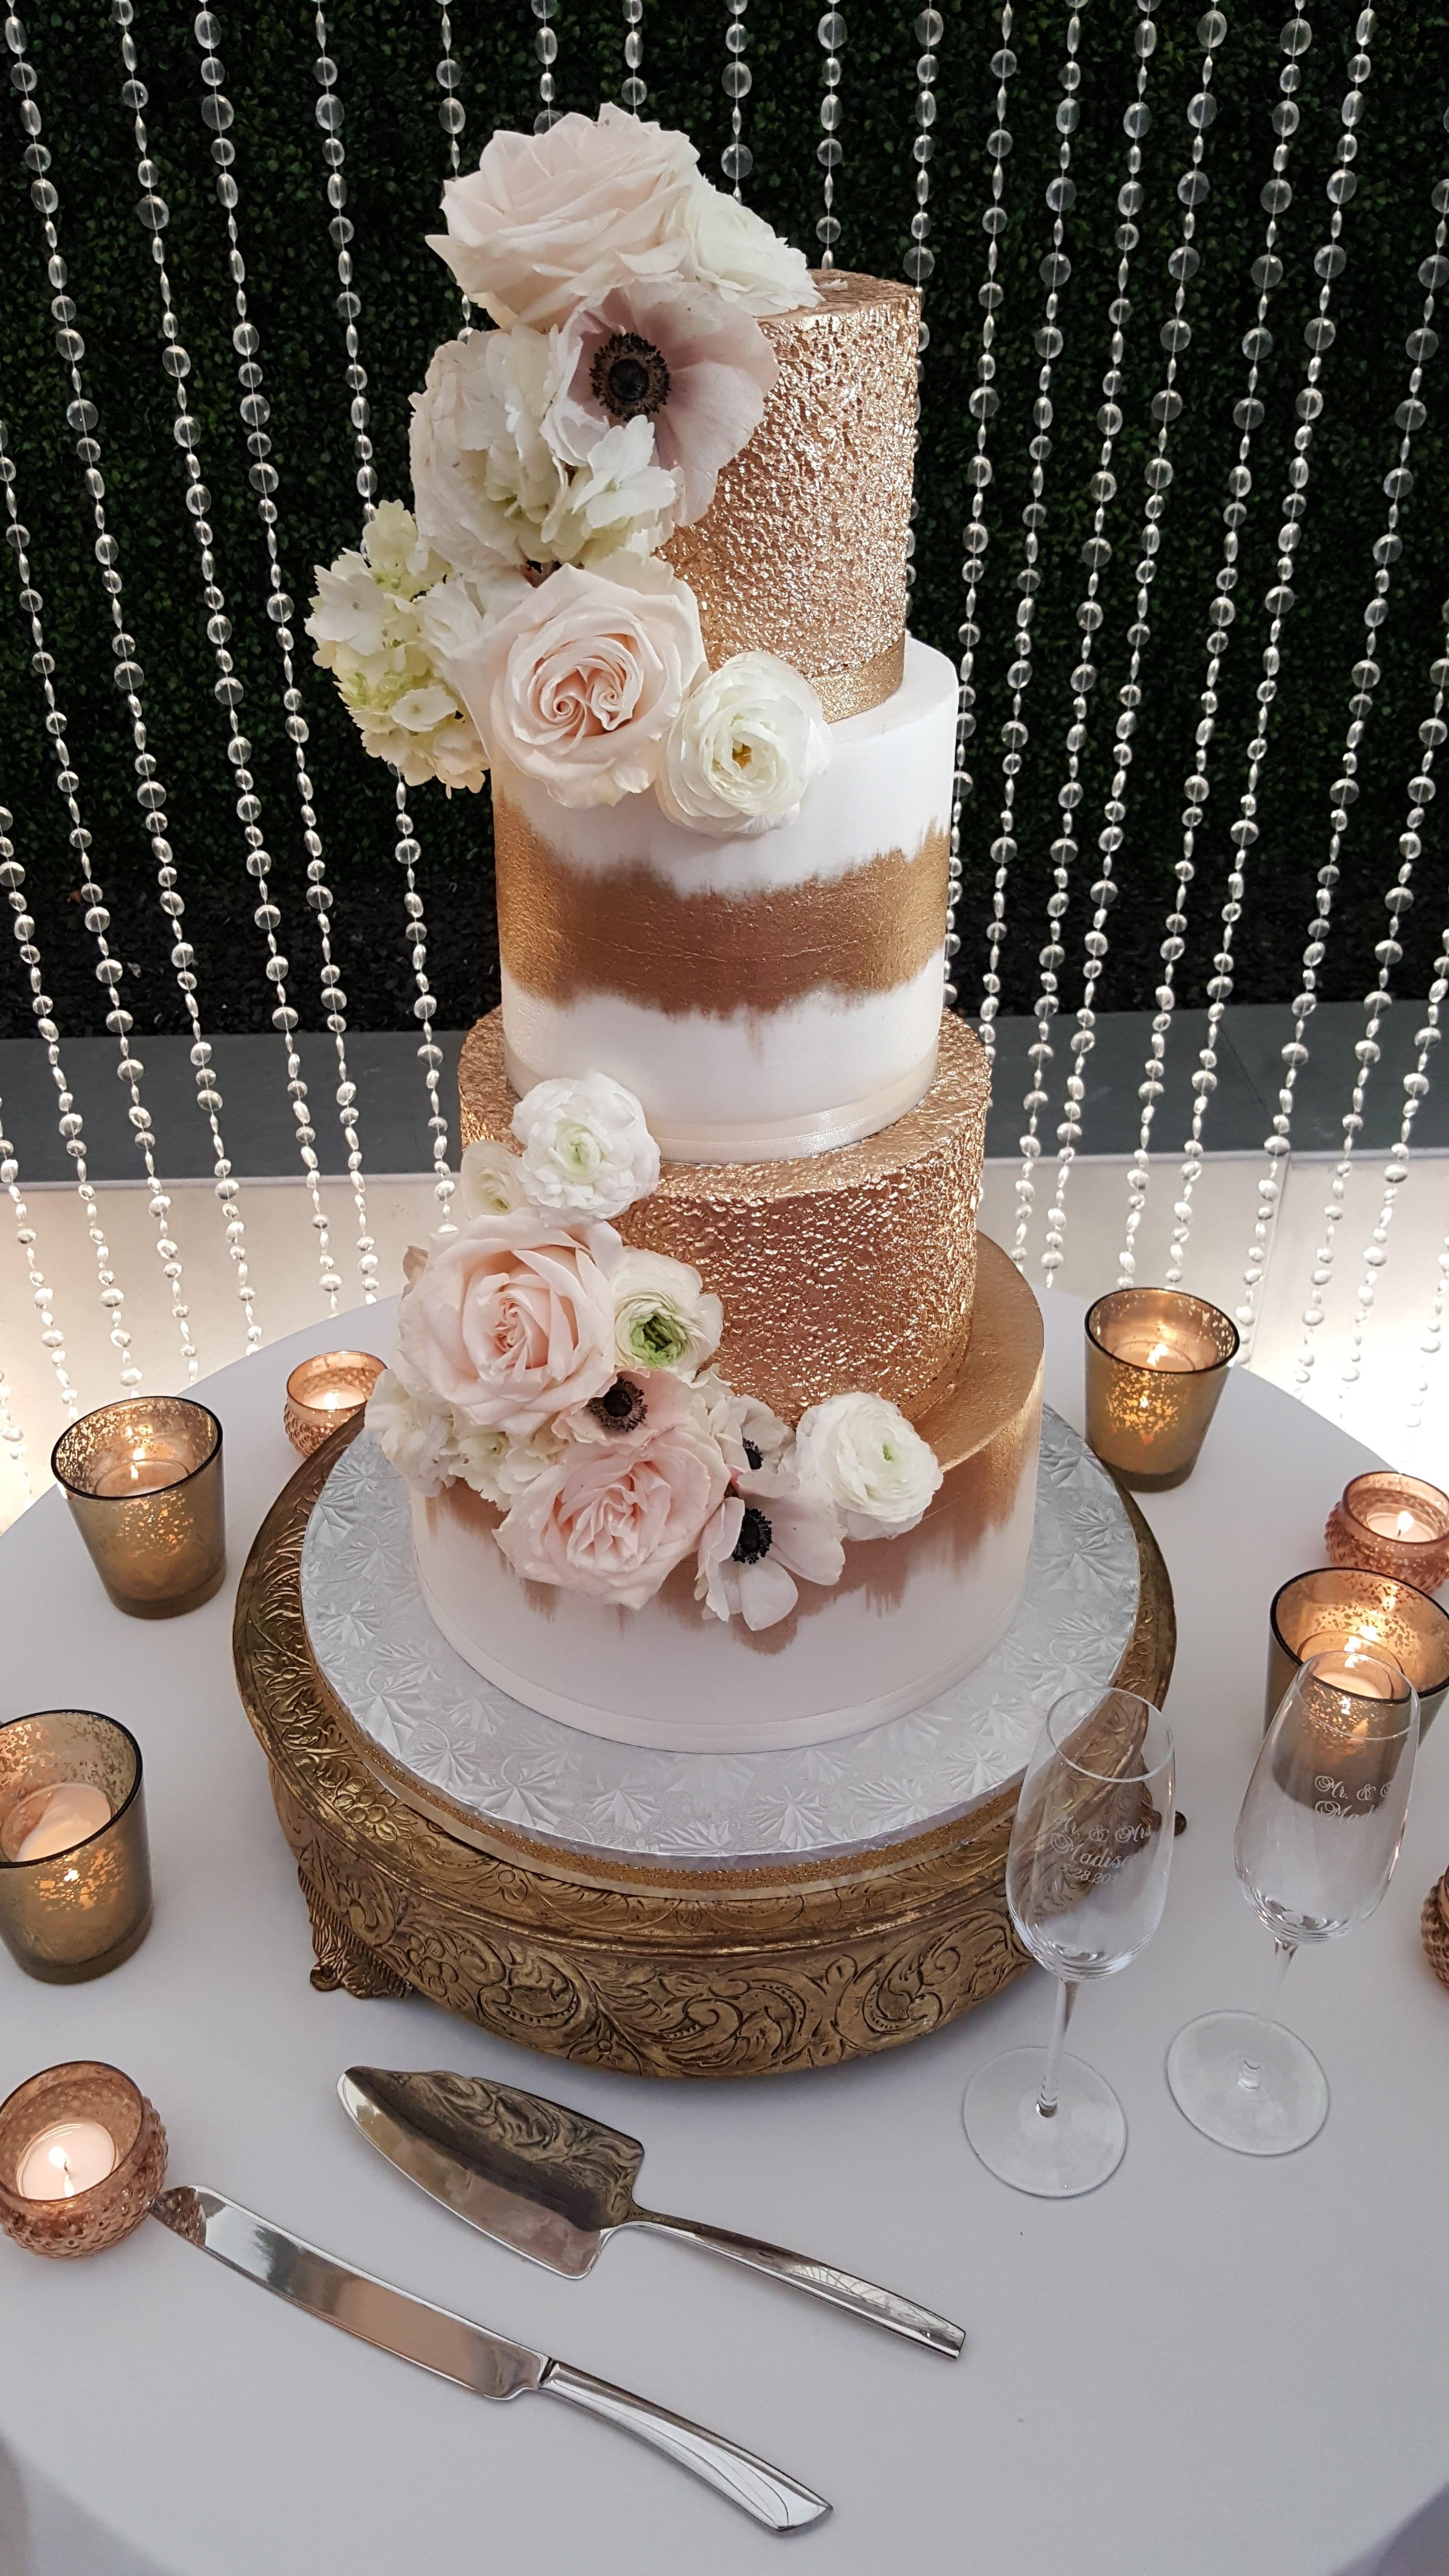 Wedding Cakes by Tammy Allen image 14